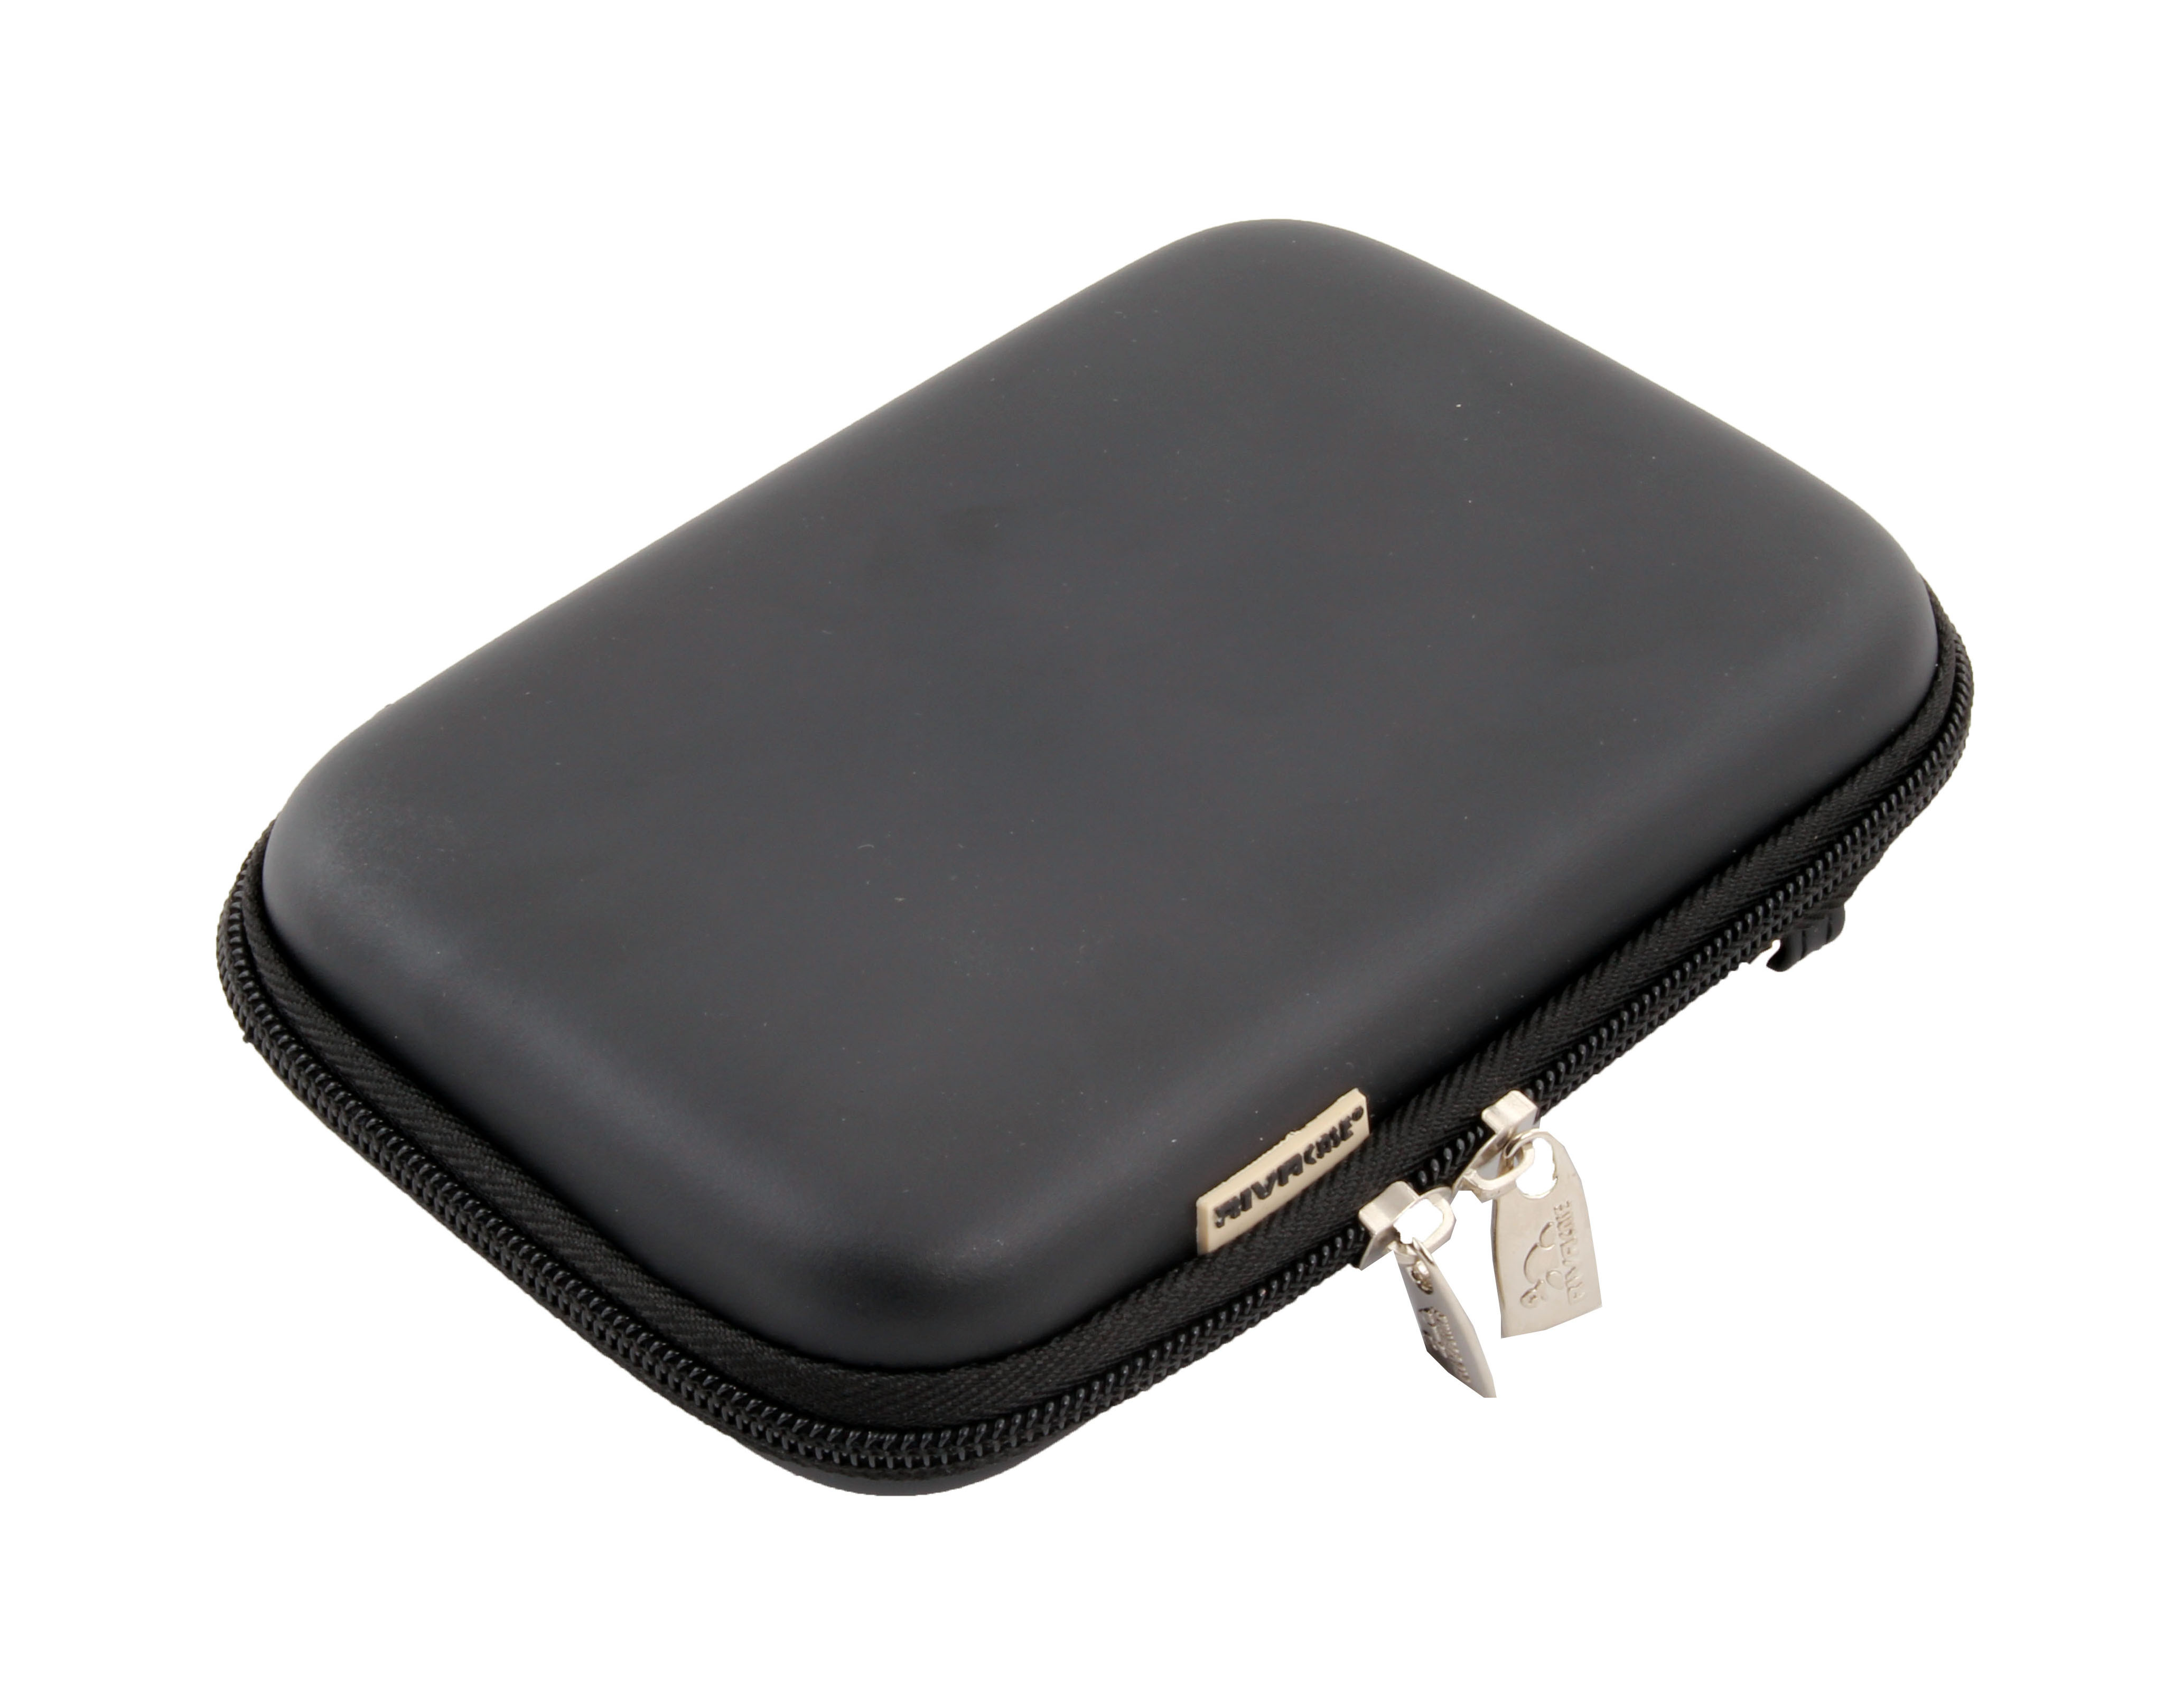 Кейс для жесткого диска Riva case Real Brand Technics 333.000